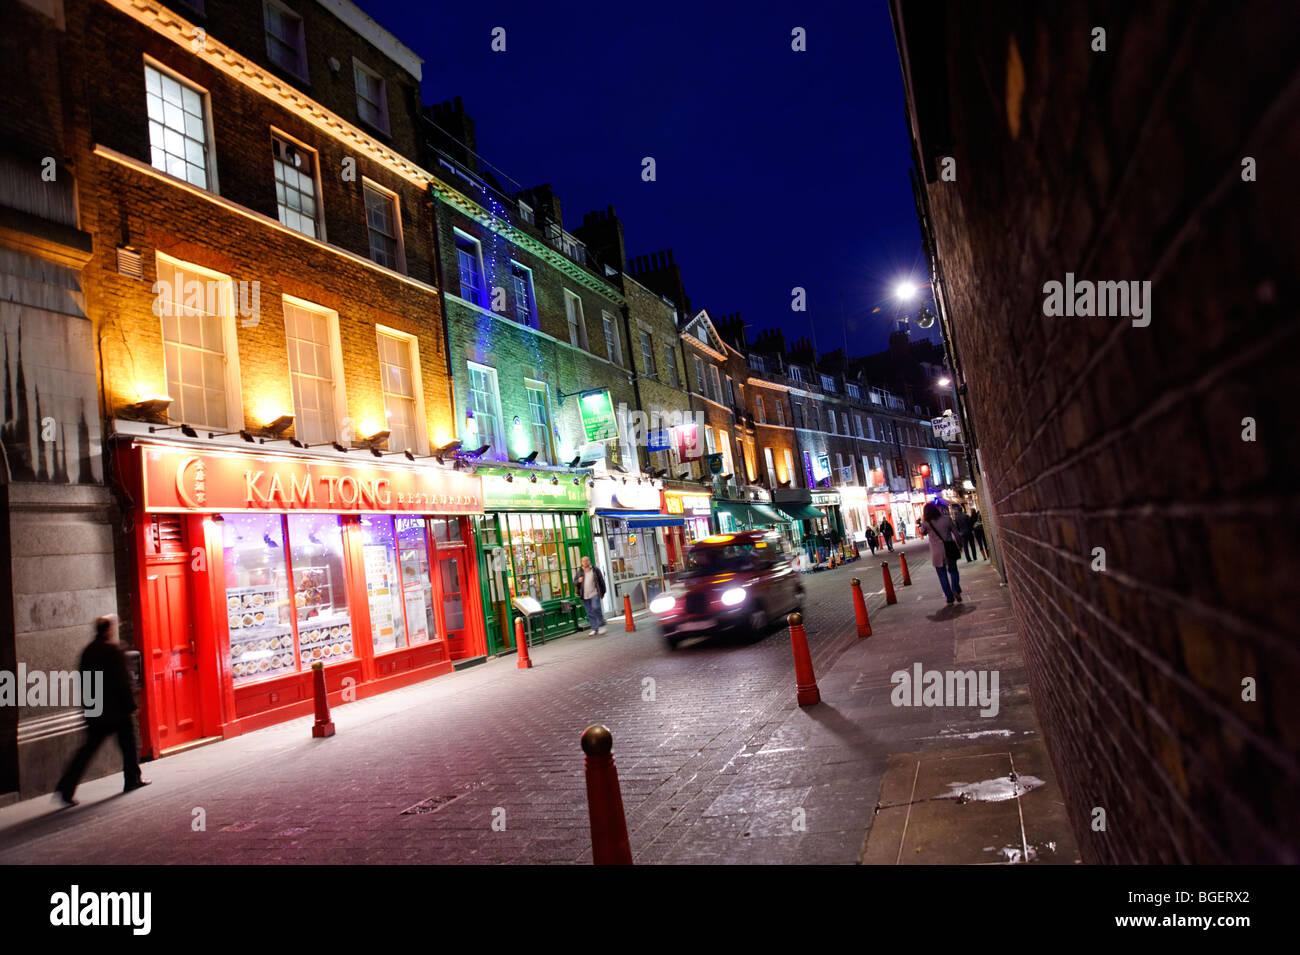 Row of Chinese restaurants in backstreet of Chinatown. Lisle Street. Soho. London. UK 2009 - Stock Image